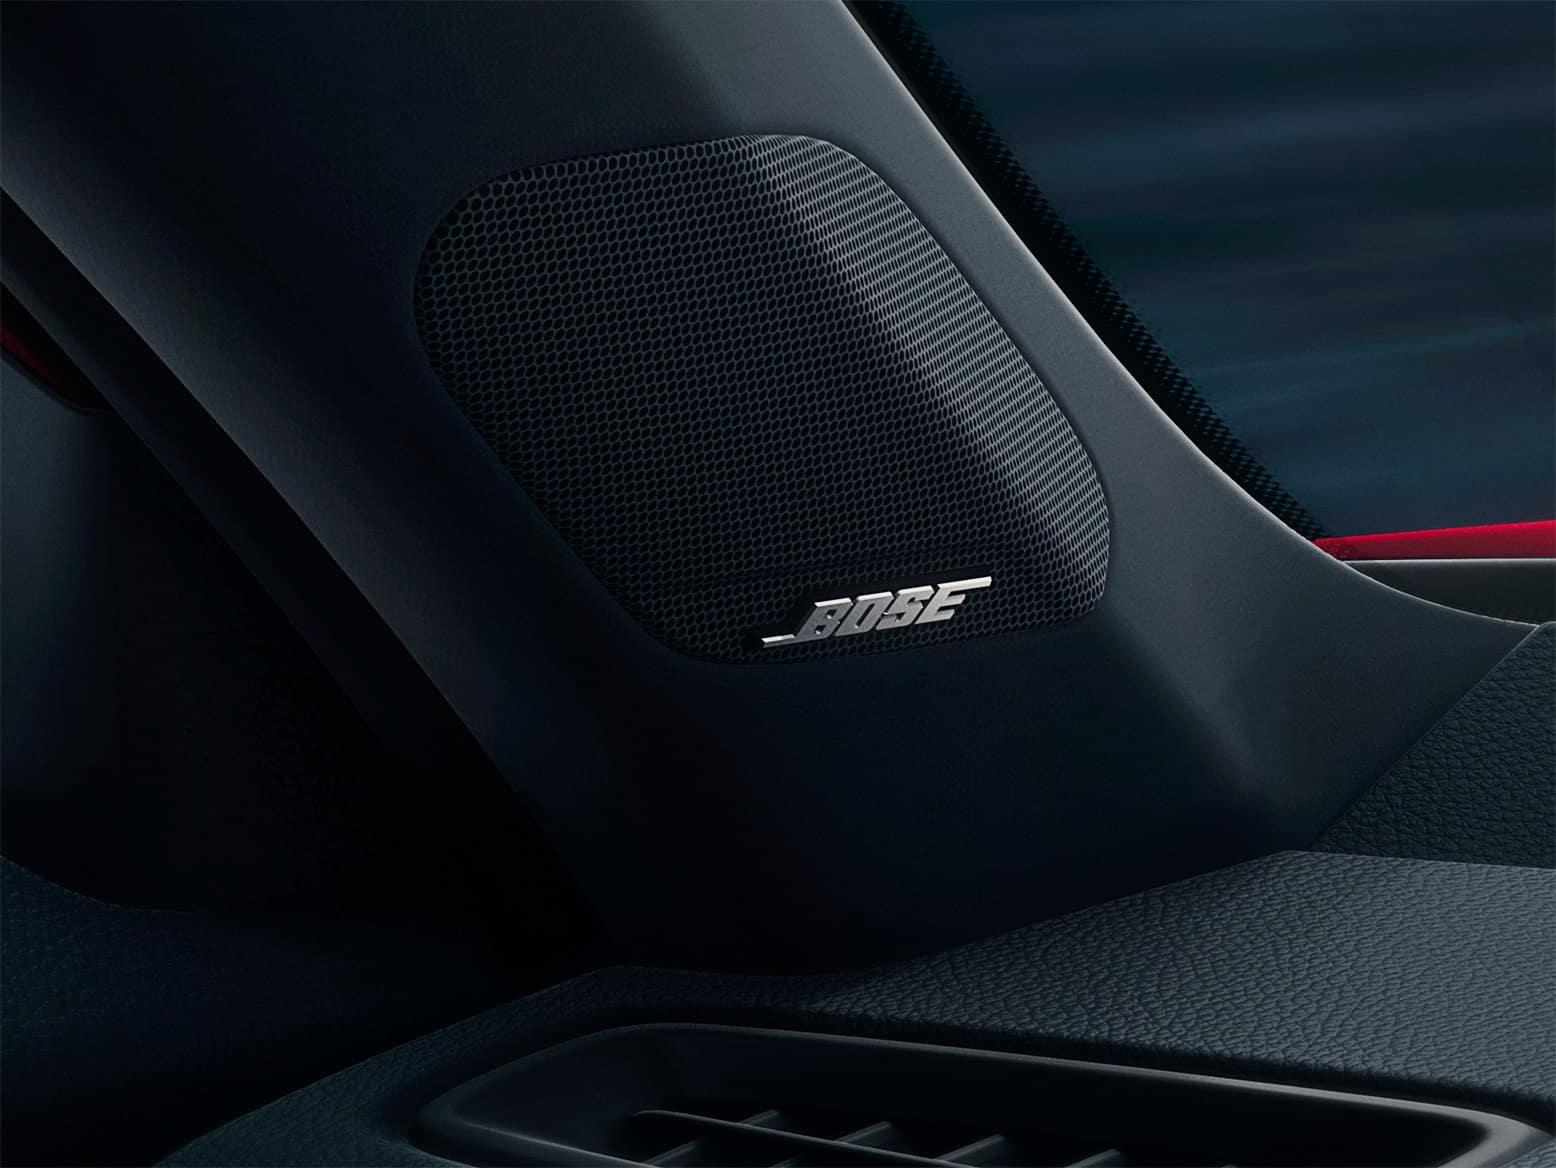 2022 Honda Civic with bose audio system